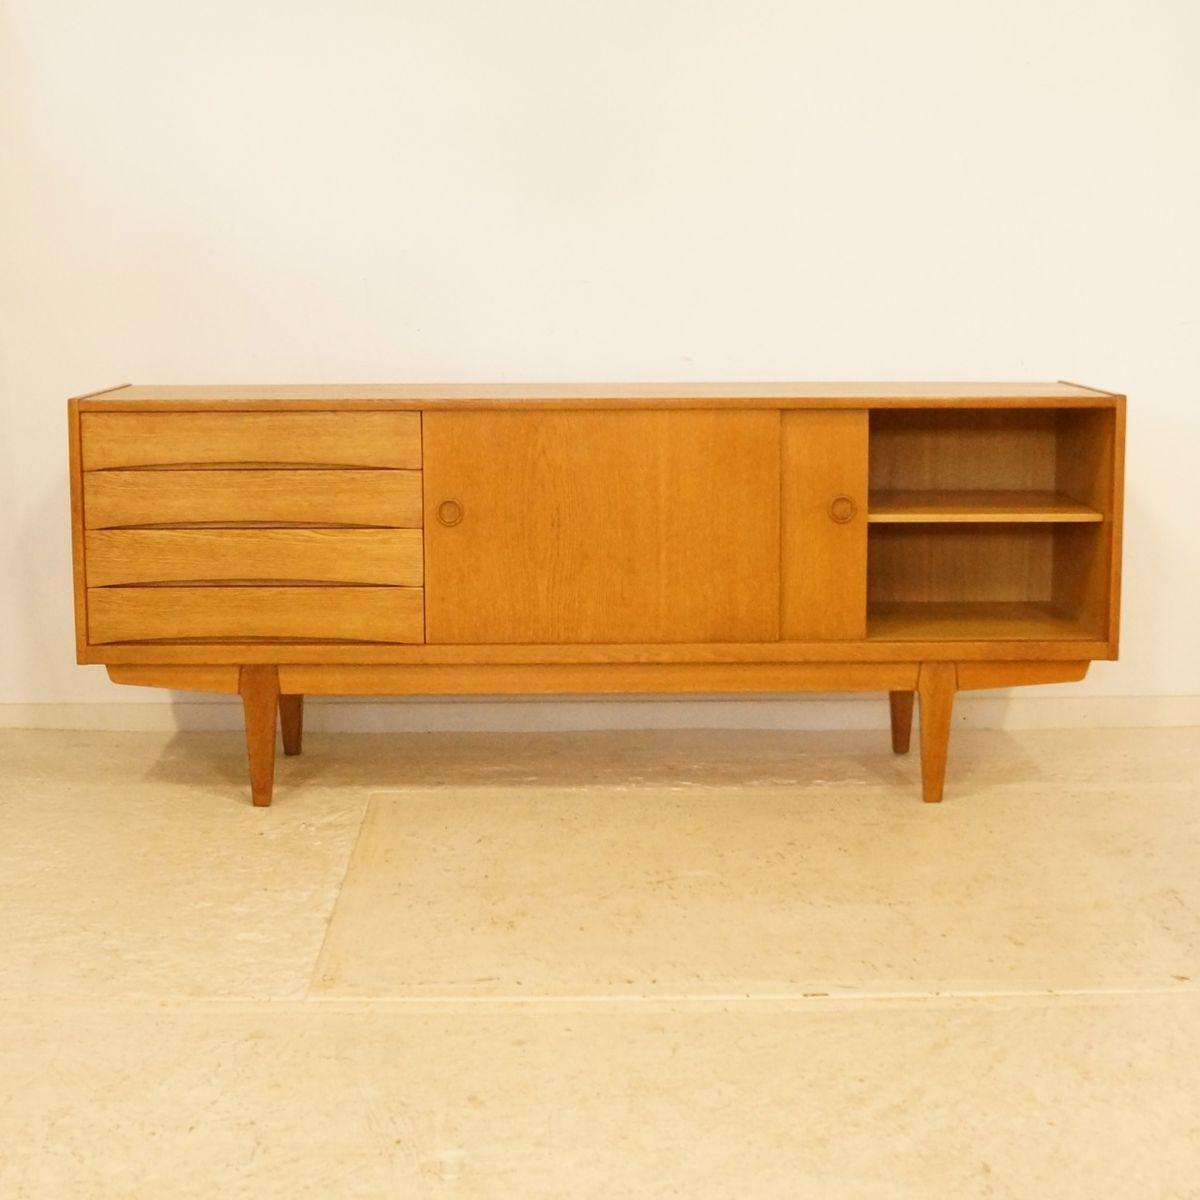 vintage sideboard from fristho 1960s for sale at pamono. Black Bedroom Furniture Sets. Home Design Ideas